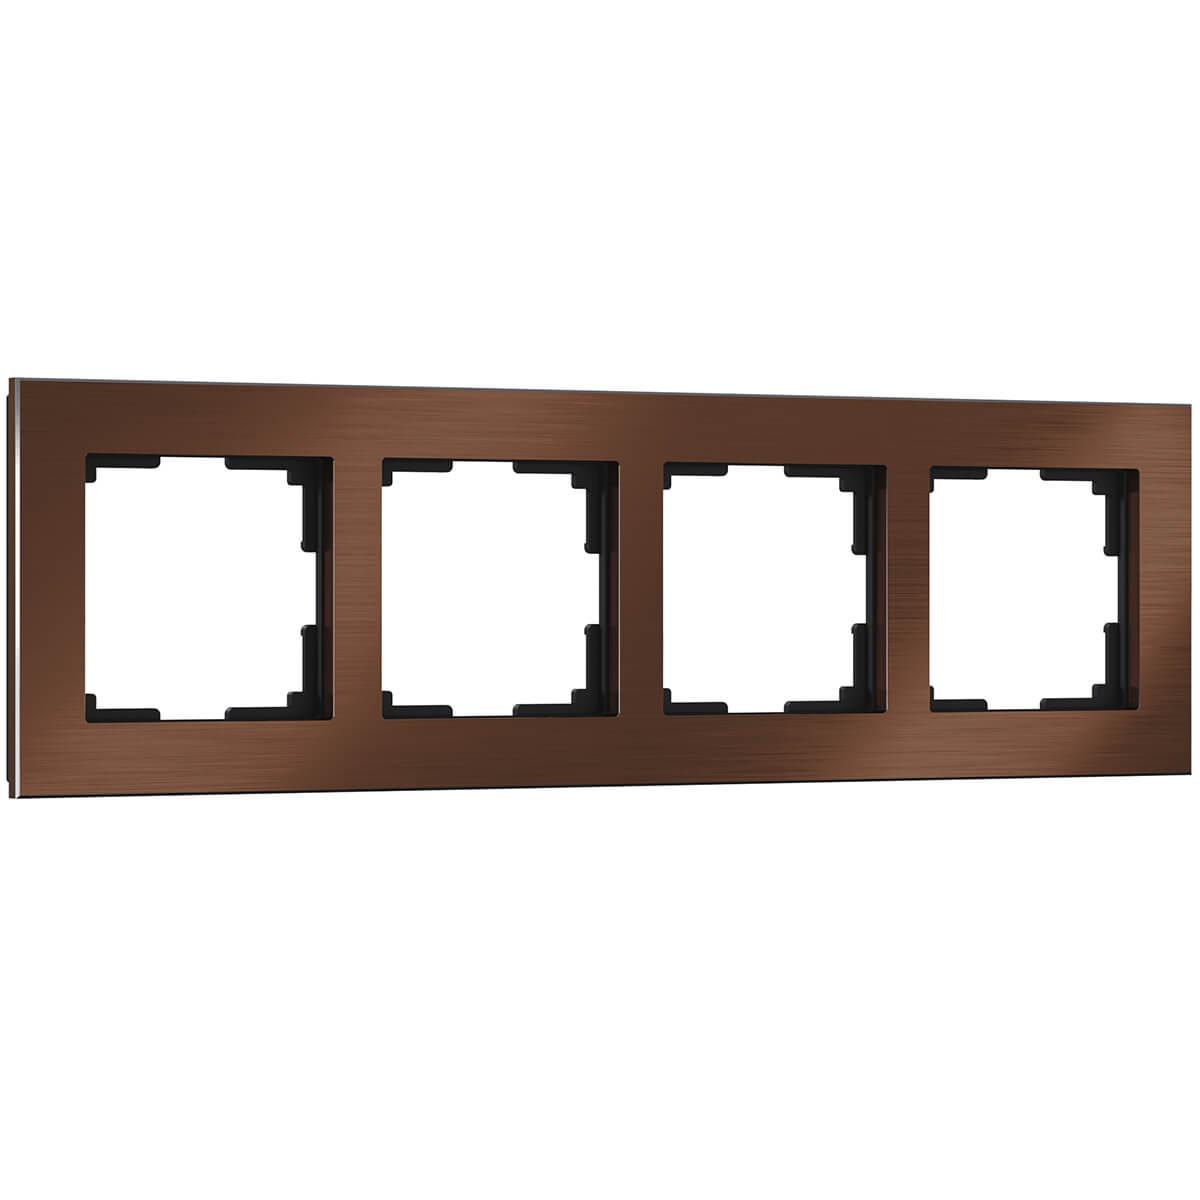 Рамка Aluminium на 4 поста алюминий коричневый WL11-Frame-04 4690389073717 цена